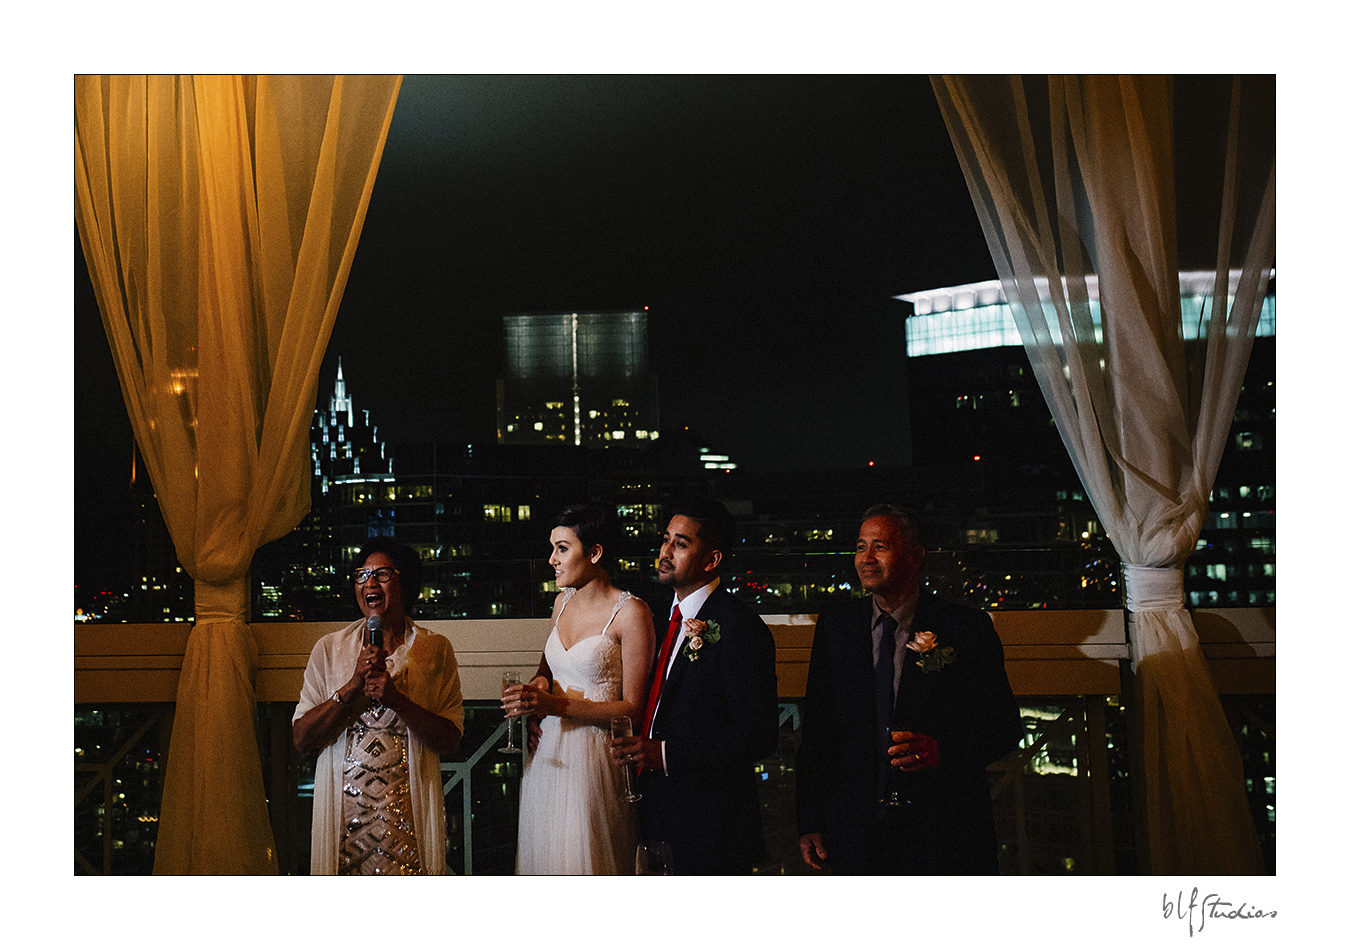 0040-blfstudios-wedding-photographer-daniel-danielle-atlanta.jpg